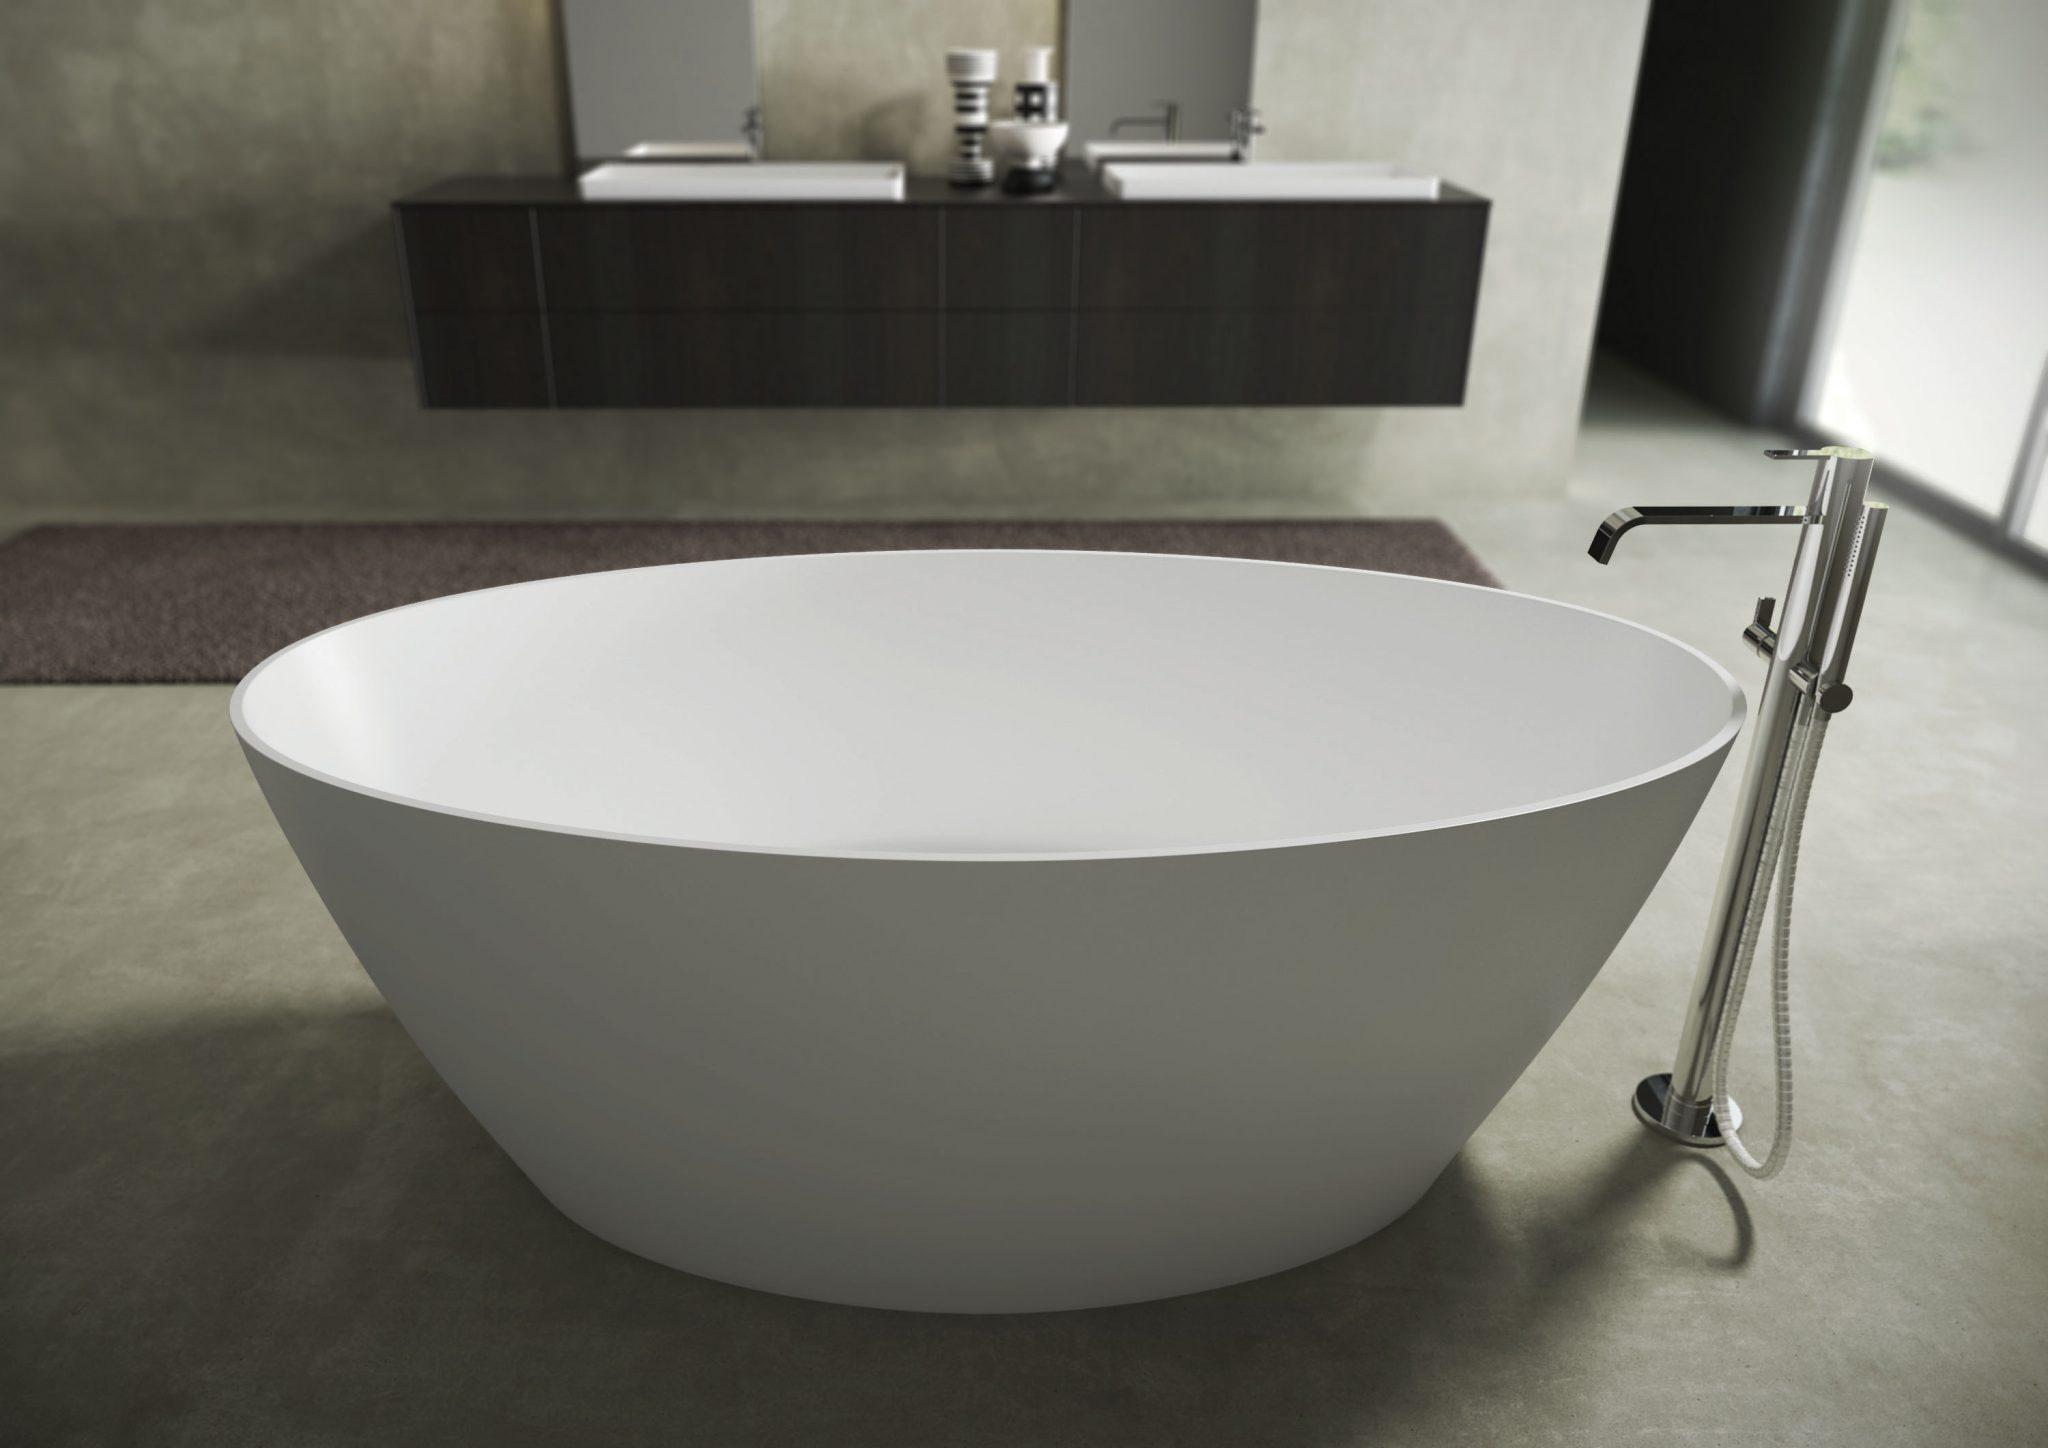 Vasca Da Bagno 160 80 : Vasche da bagno villeroy boch